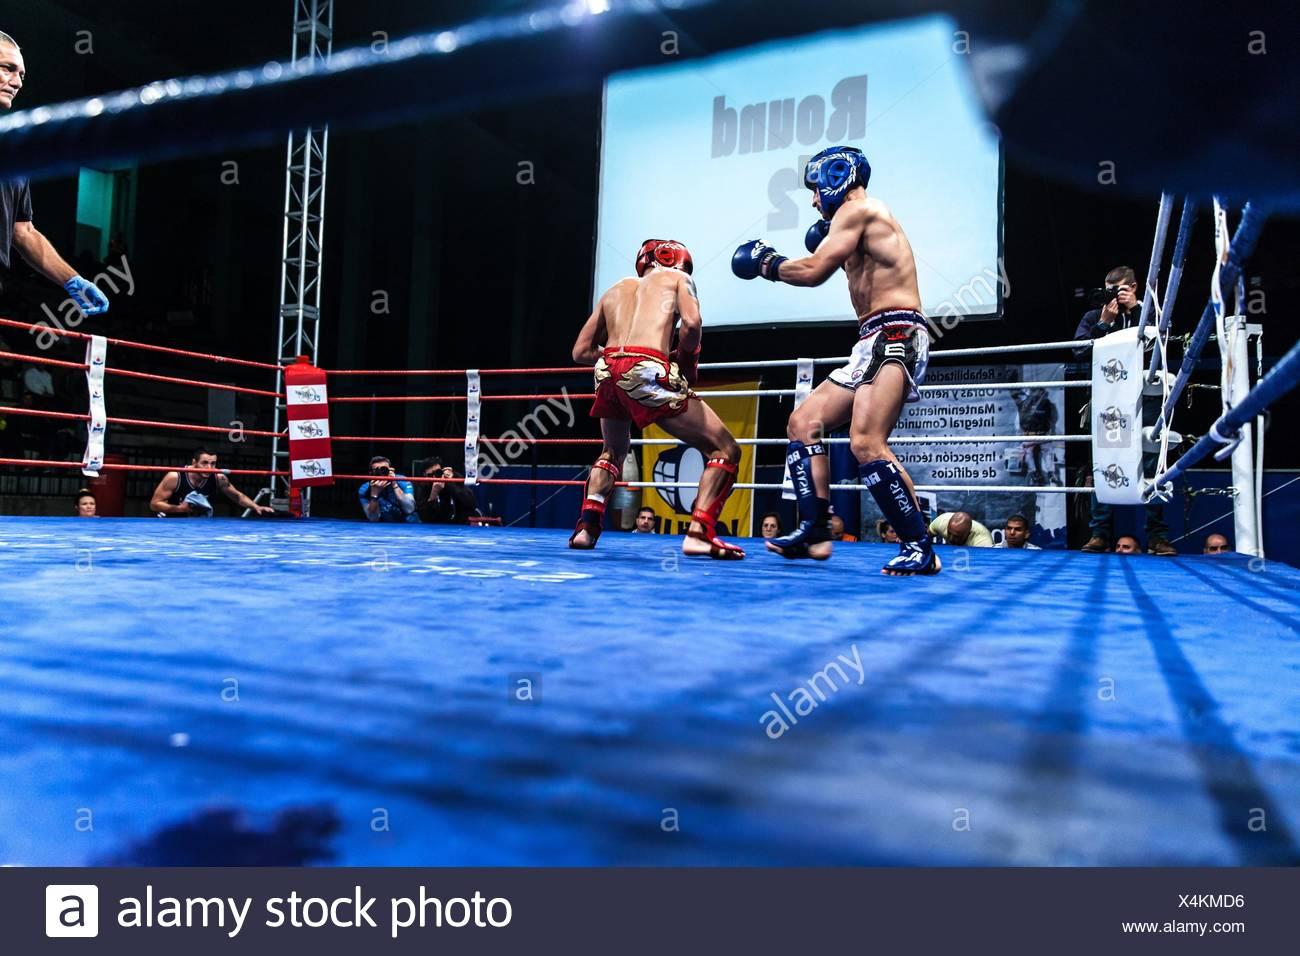 male versus male kickboxing match - Stock Image